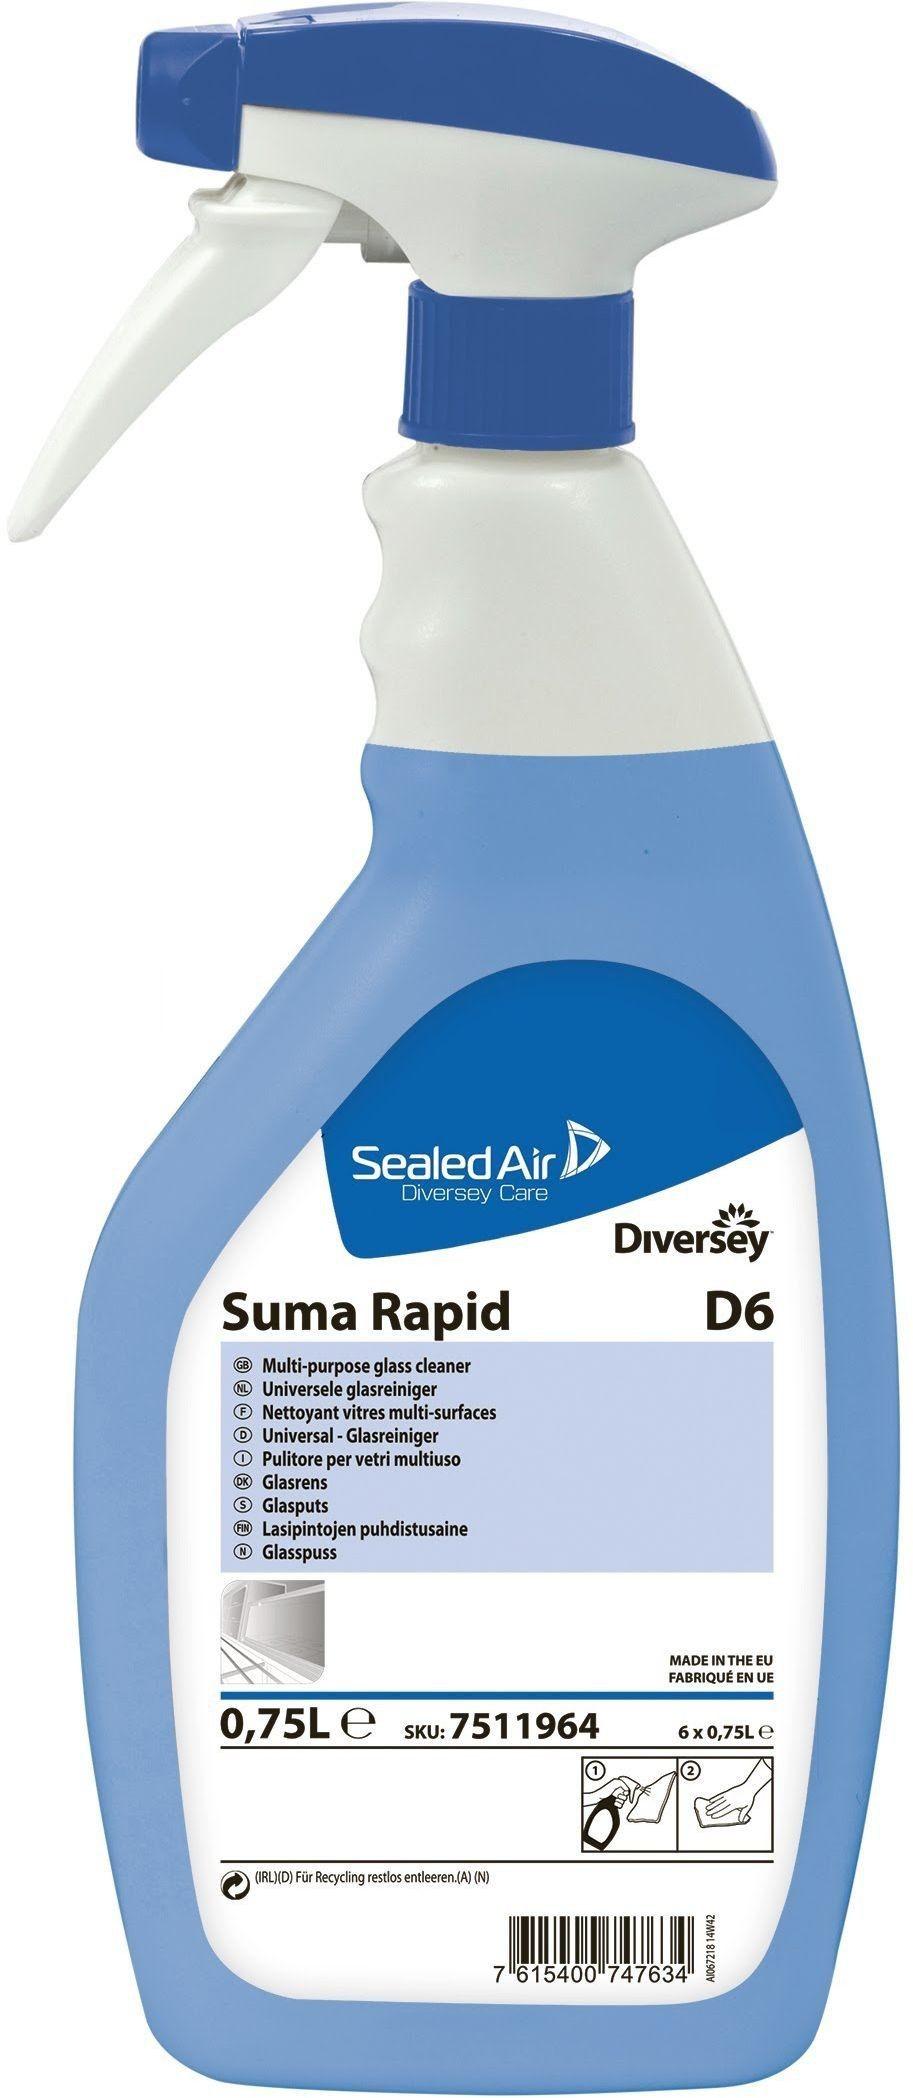 Suma Rapid D6 nettoyant vitres 750ml Diversey Sealed Air